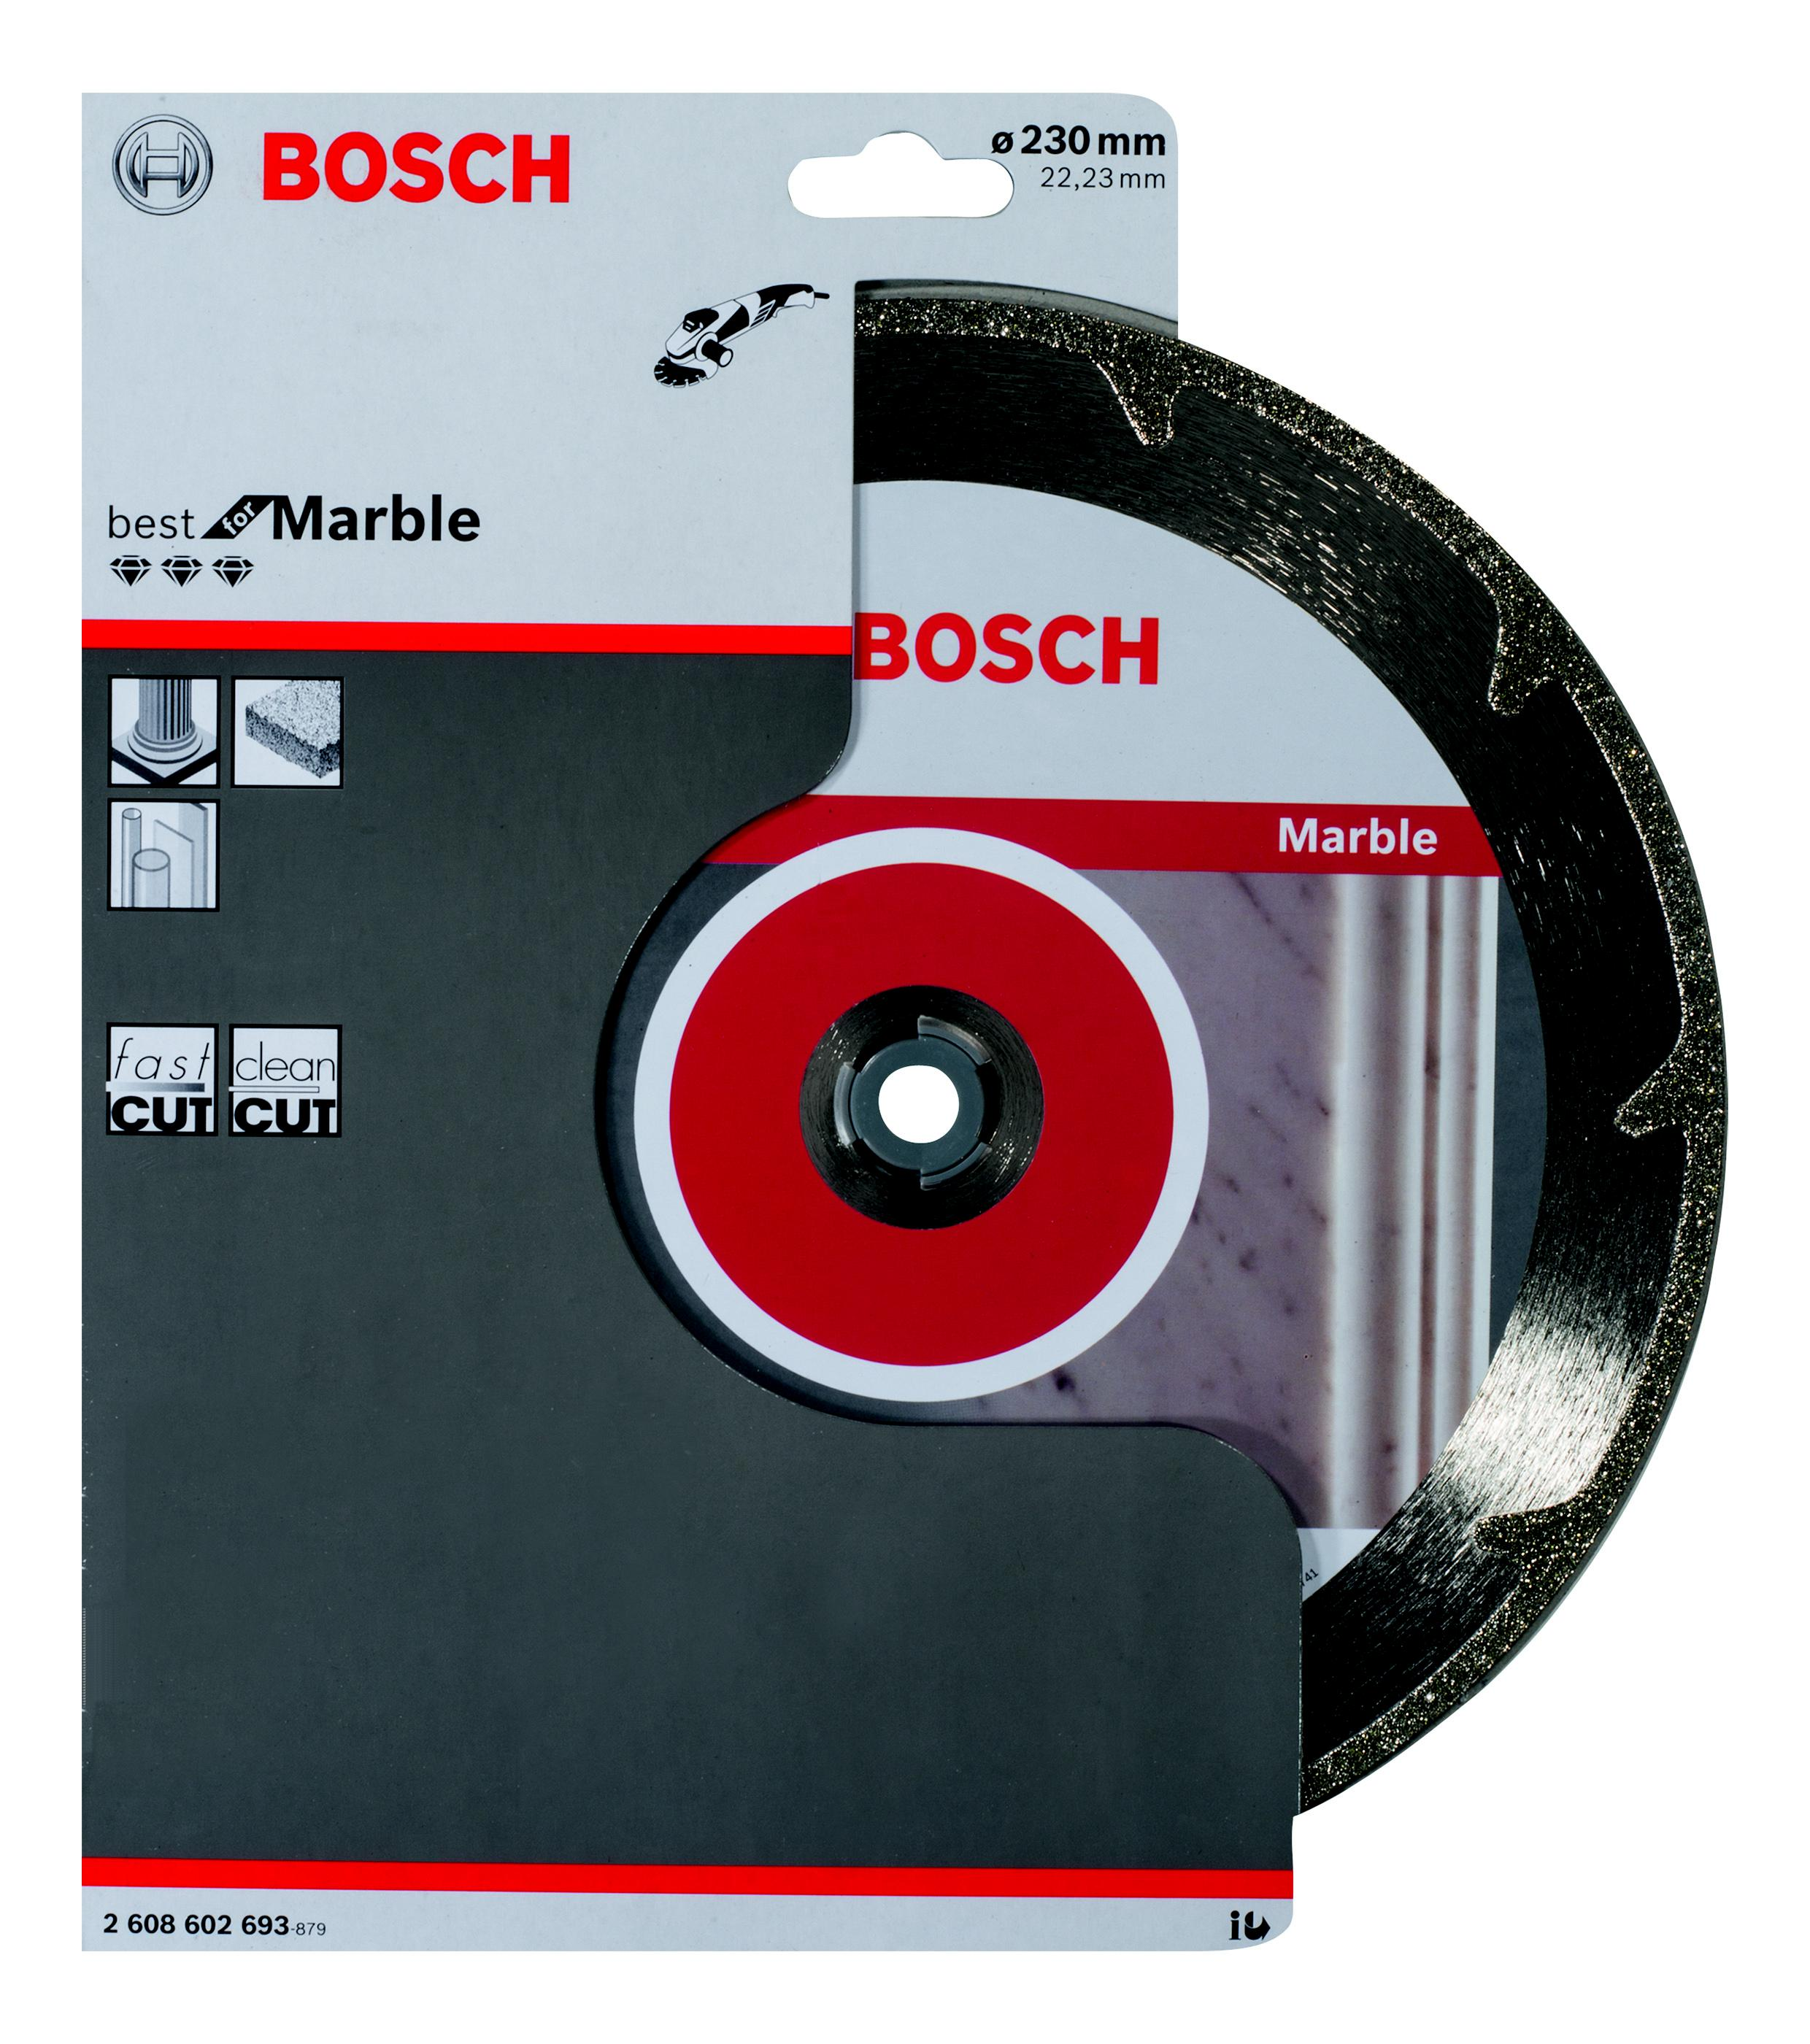 Круг алмазный Bosch Best for marble 230x22 сегмент (2.608.602.693) bosch professional for marble